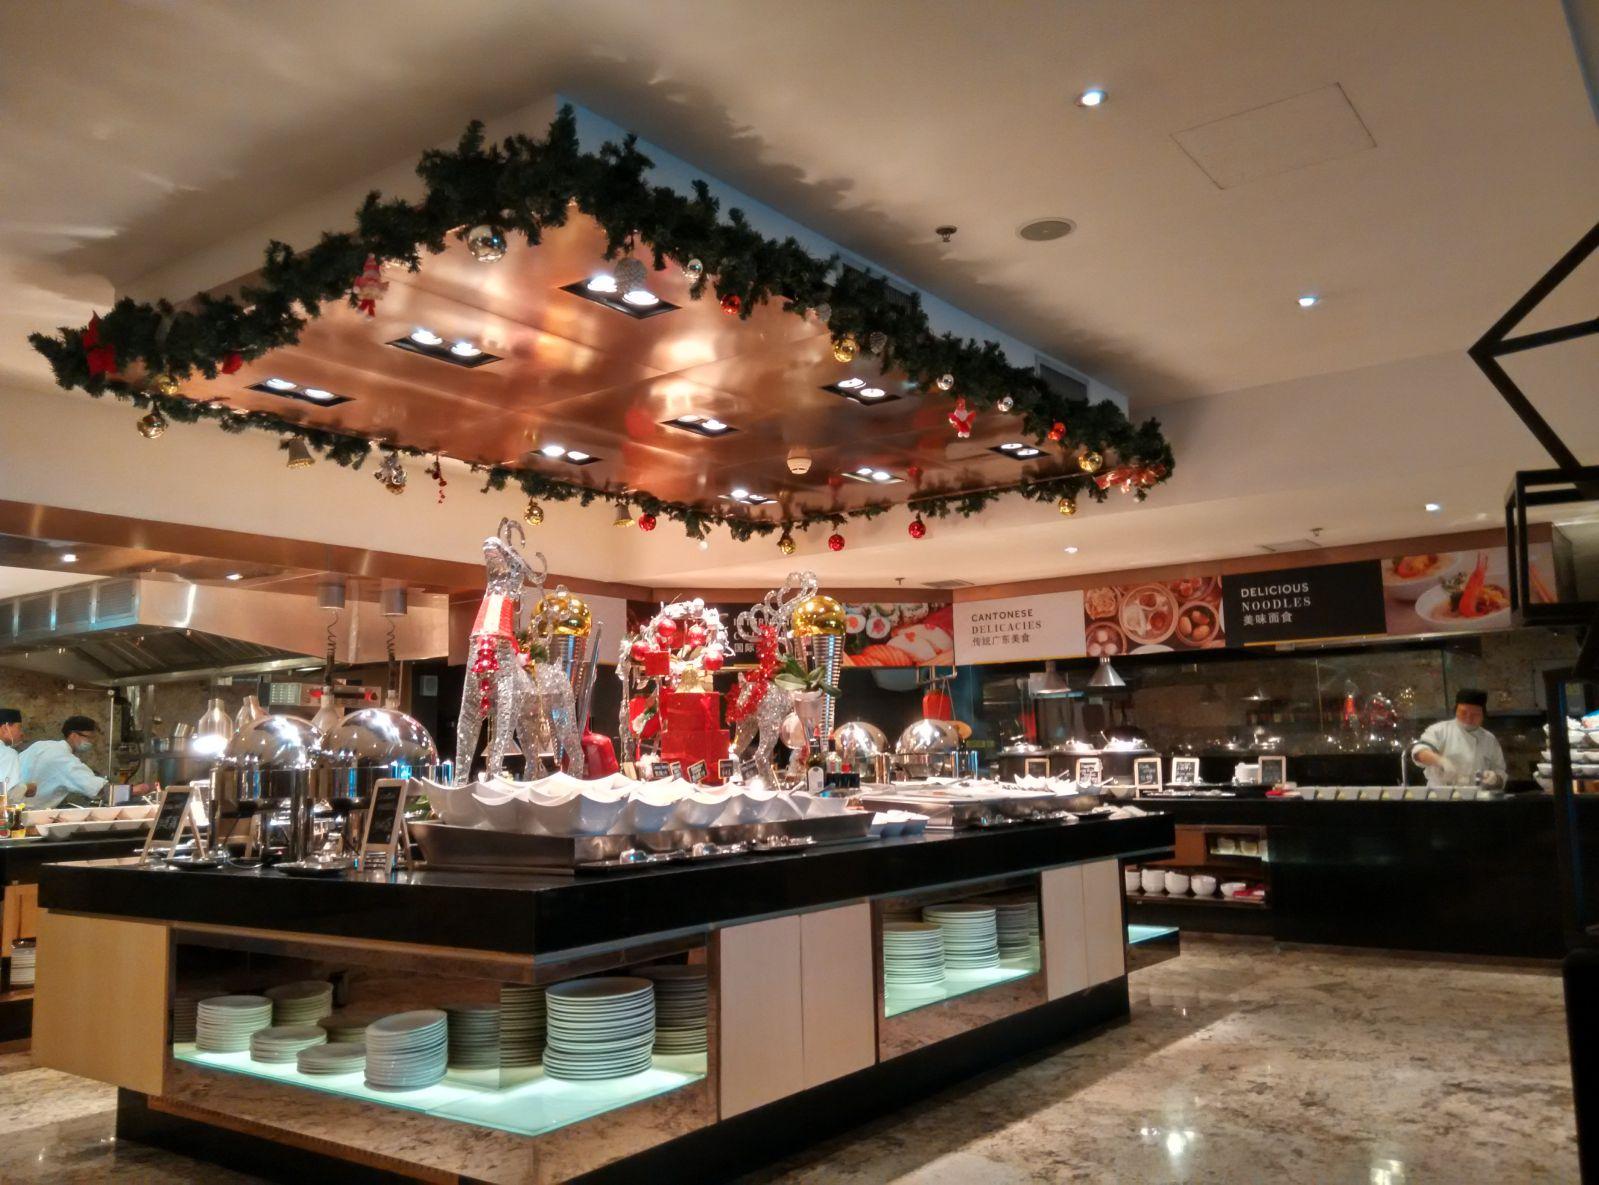 guangzhou-marriott-tianhe-restaurant